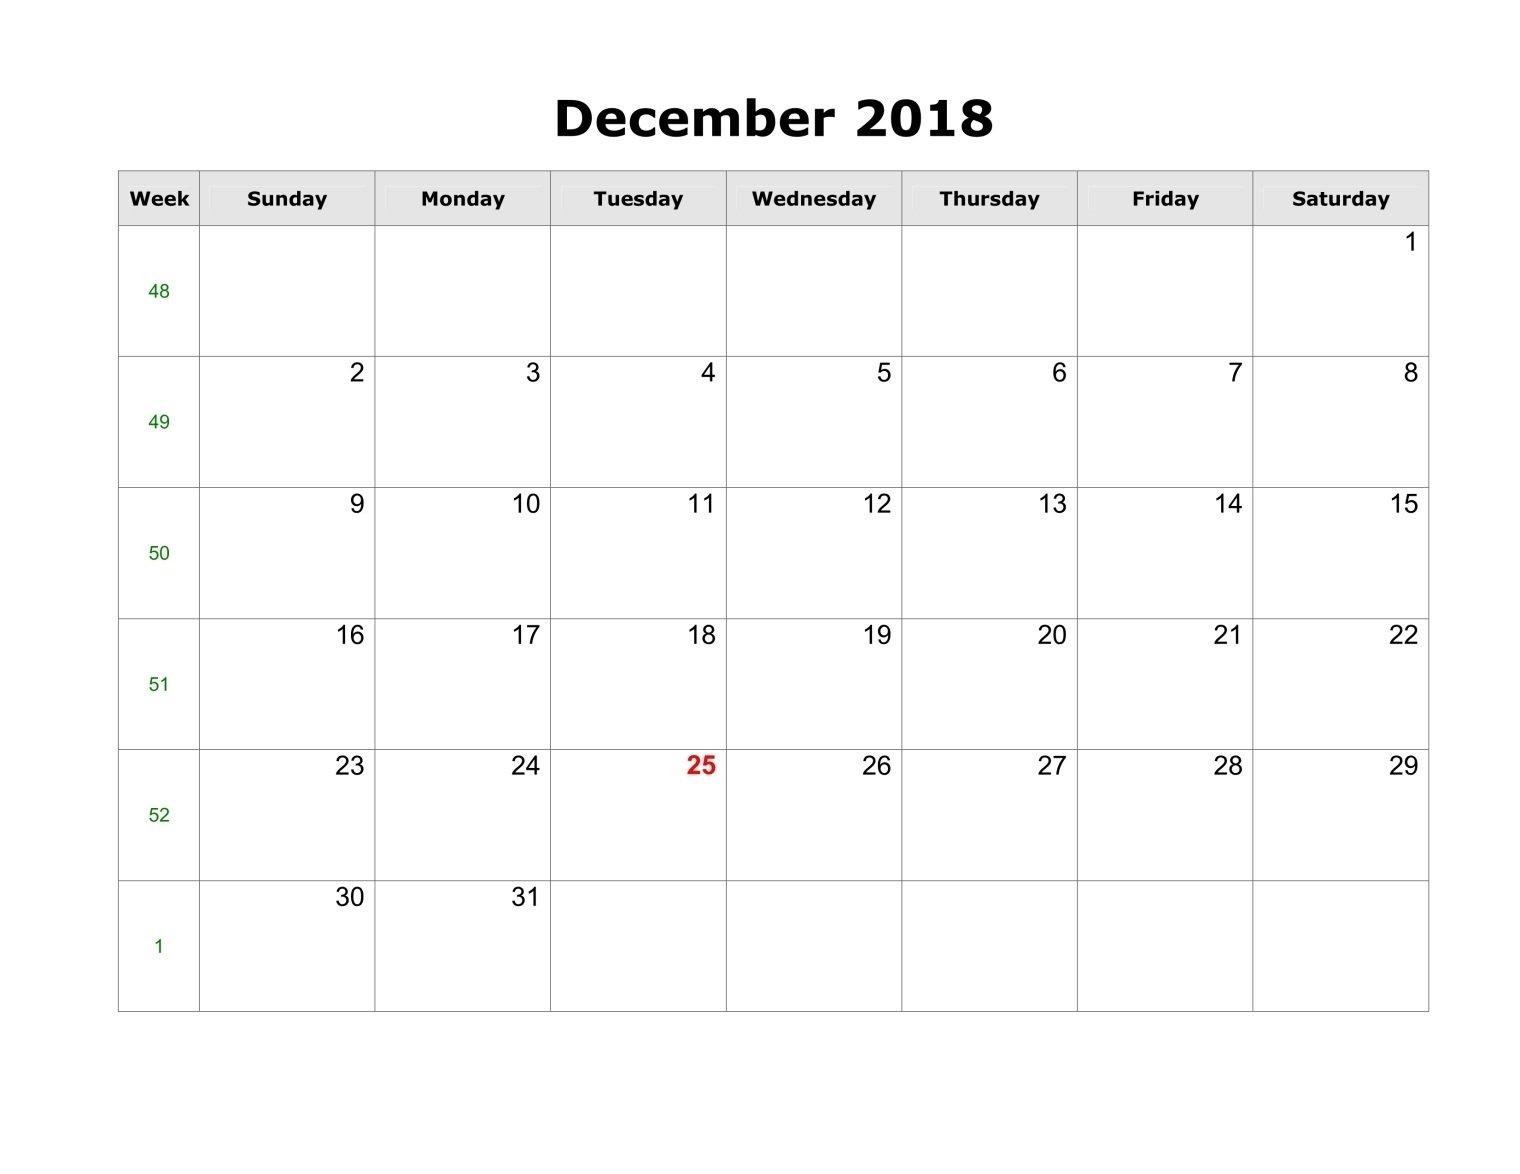 December 2018 Calendar Template Pdf, Word, Excel - Printable Calendar 2019 Template Pdf